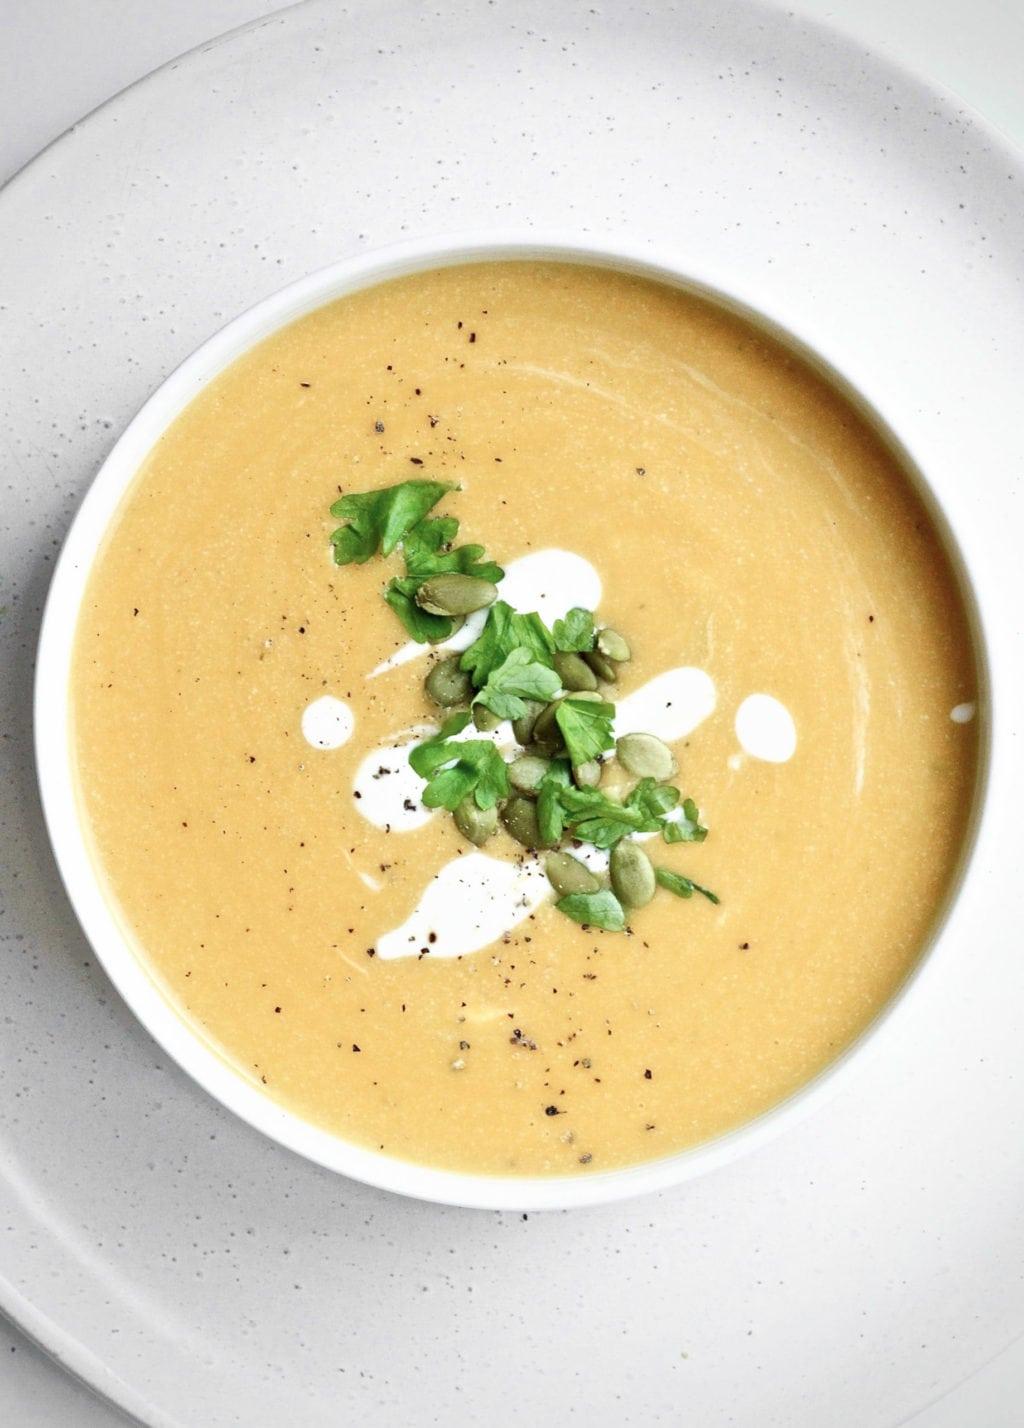 Vegan pumpkin soup garnished with cashew cream, coriander and pumpkin seeds.